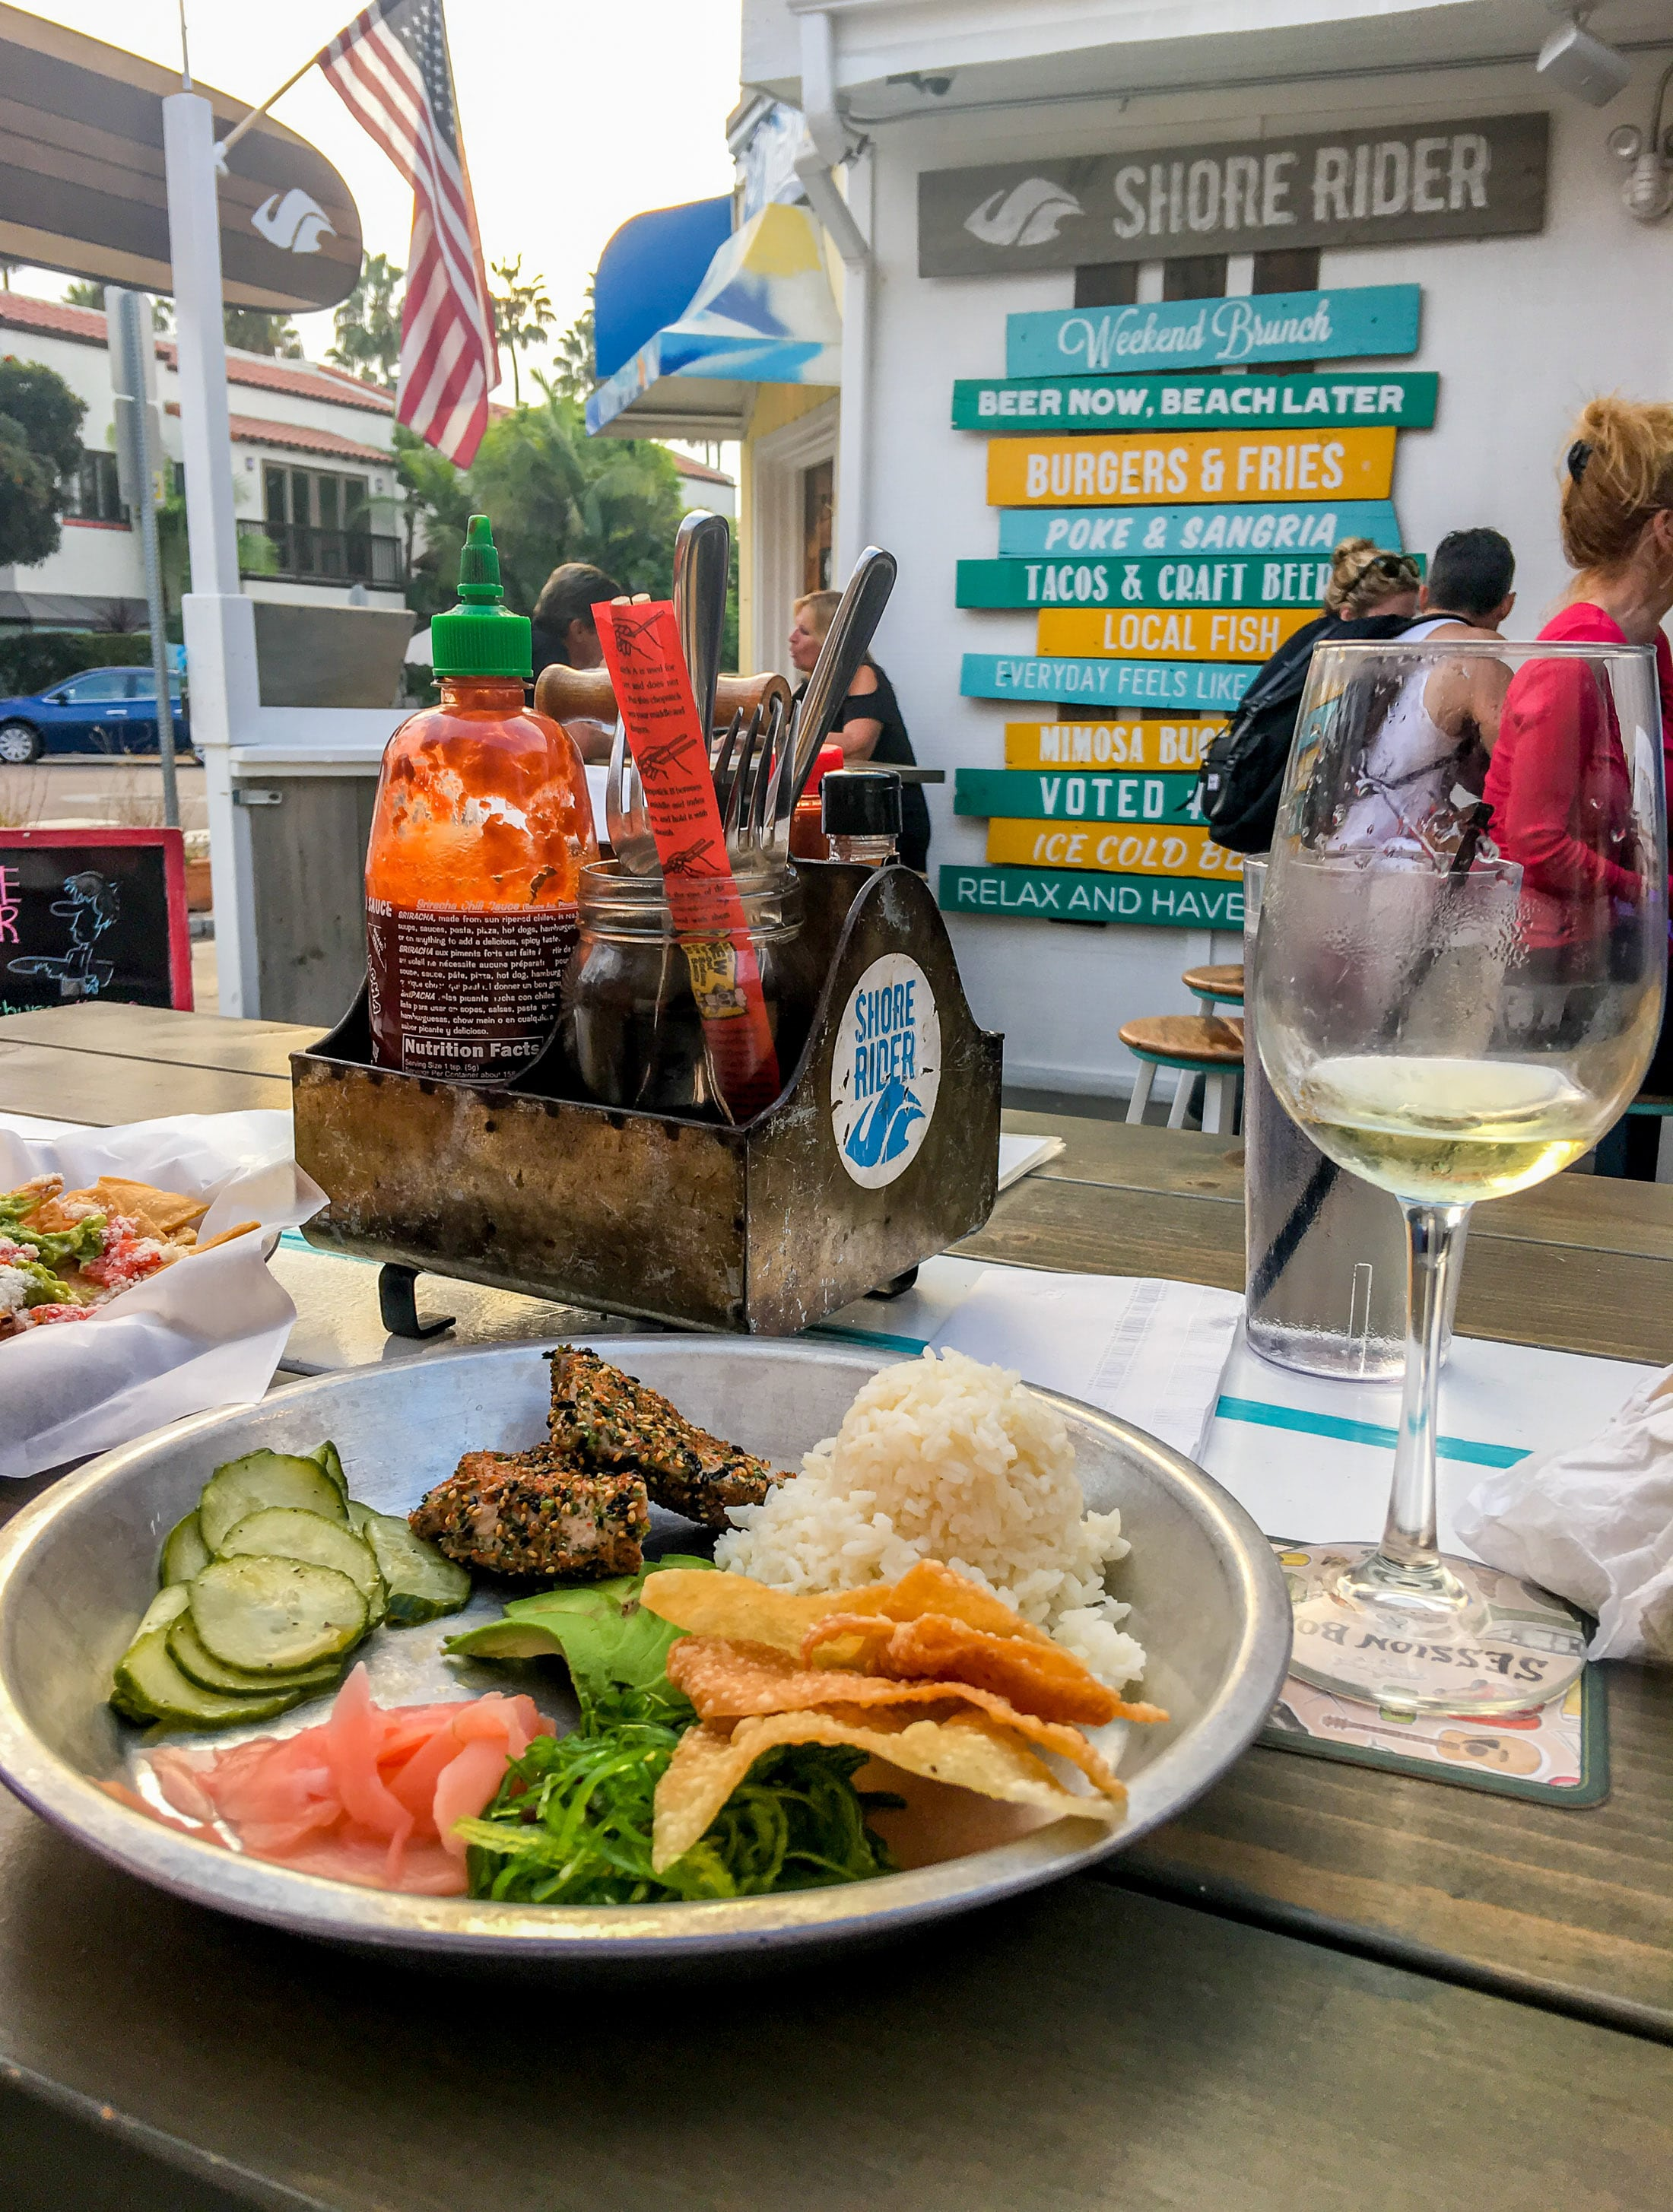 Shore Rider restaurant in La Jolla Shores